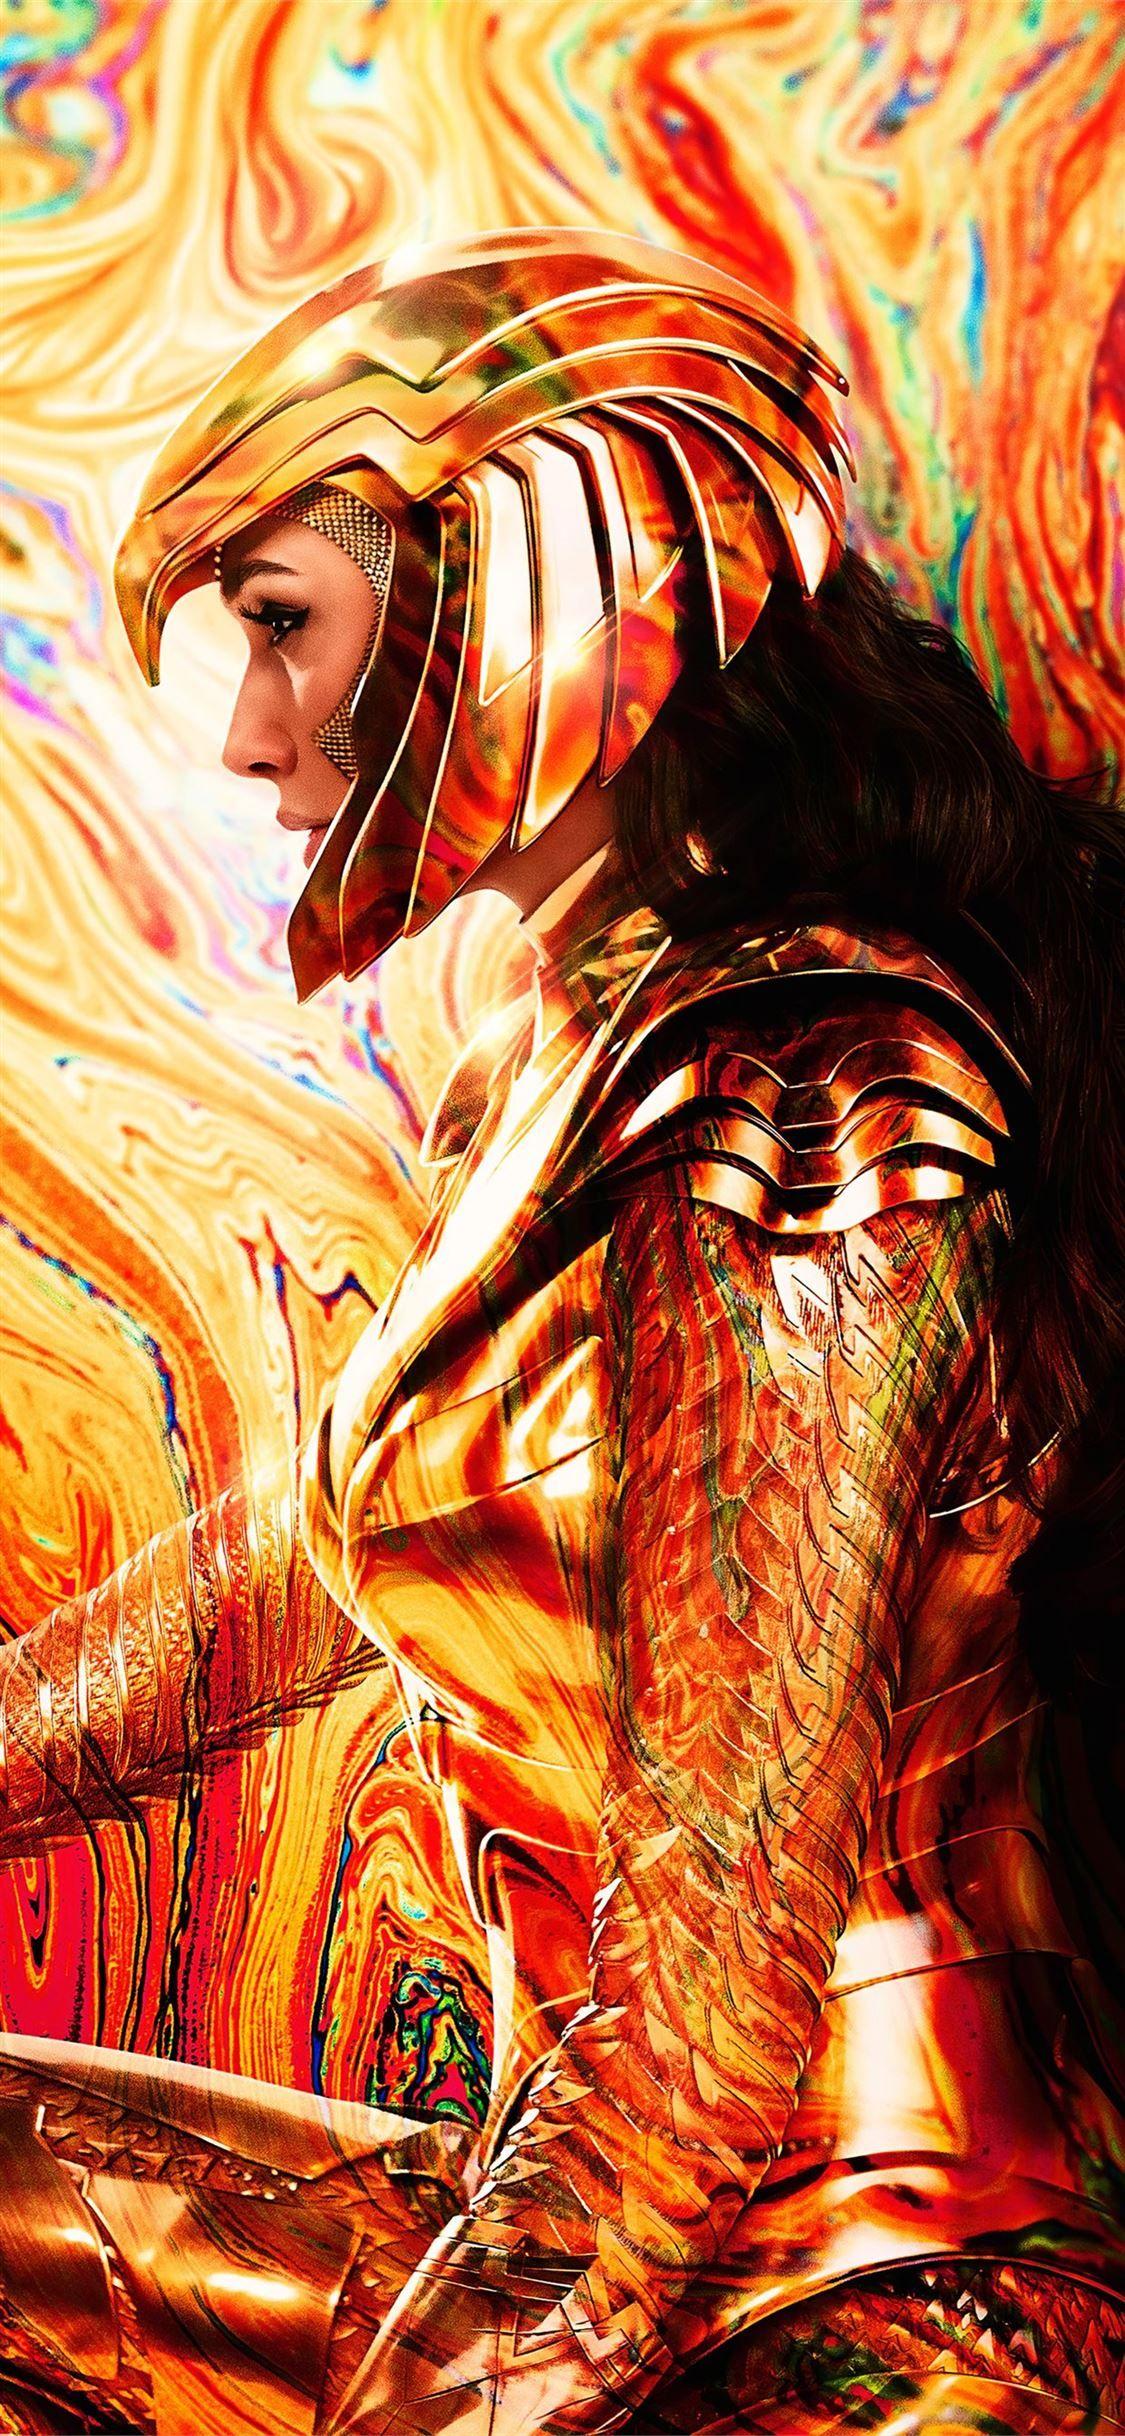 Wonder Woman 1984 International Poster 5k Wonderwoman1984 Wonderwoman2 Wonderwoman Movies 2020movie In 2020 Wonder Woman Wonder Woman Movie Gal Gadot Wonder Woman